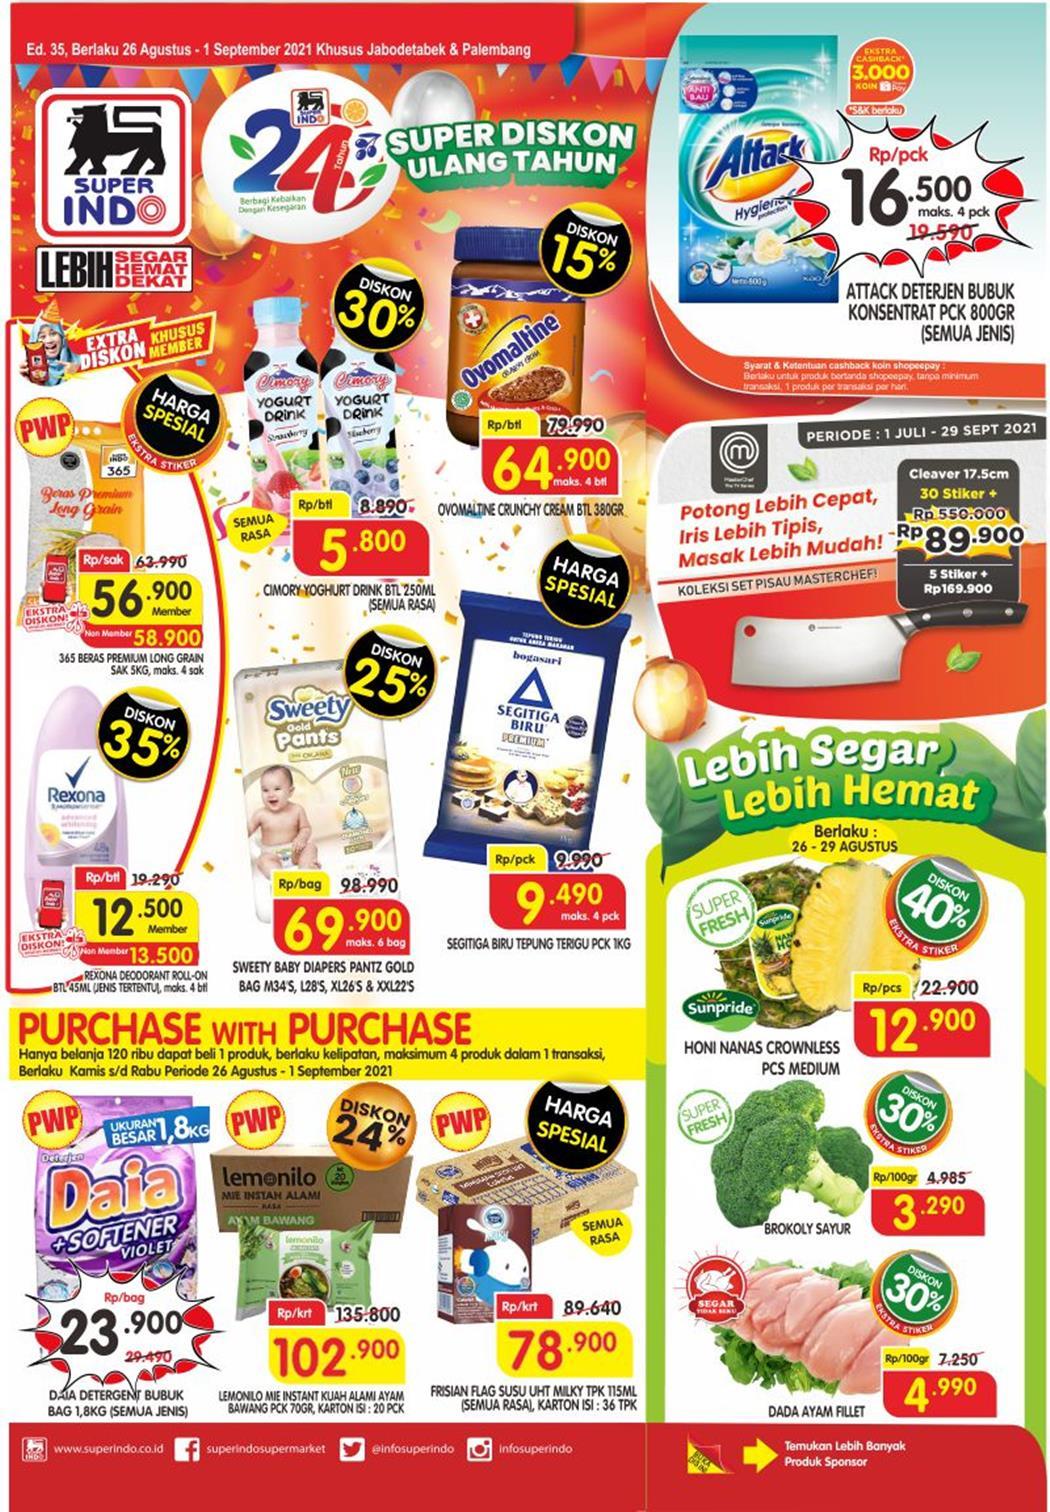 Katalog Superindo Promo Superindo Mingguan 26 Agustus - 1 September 2021